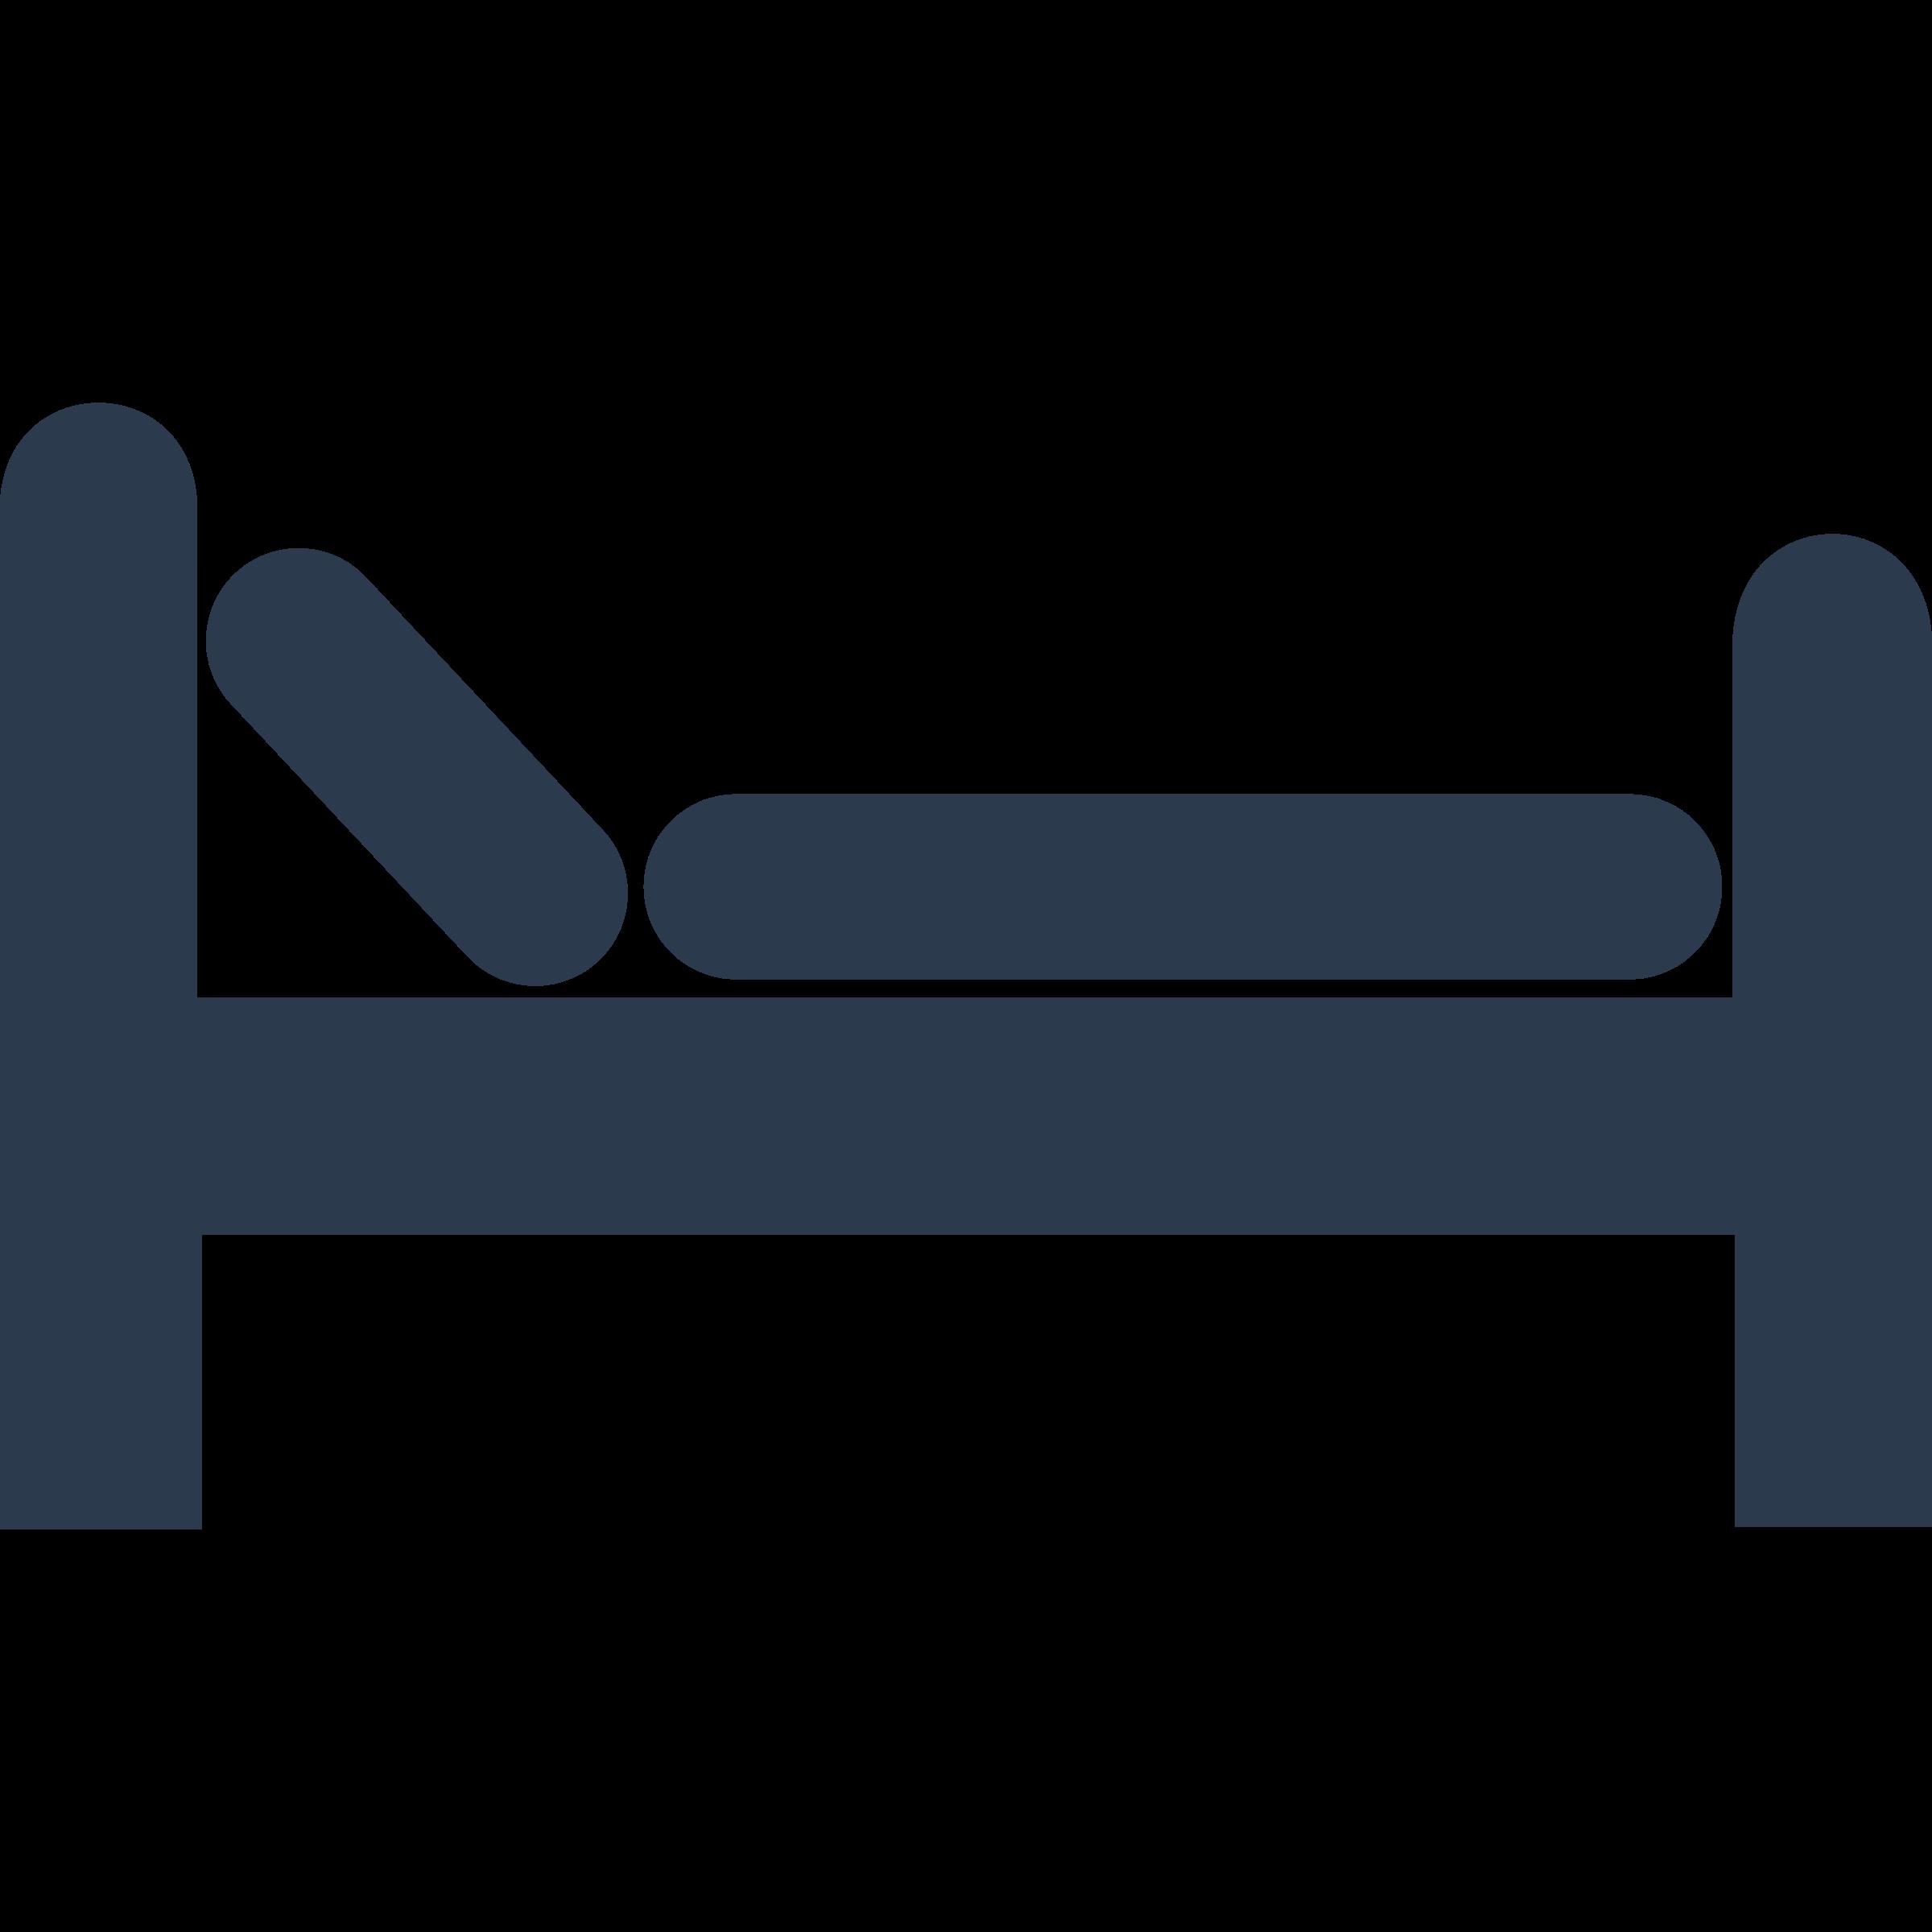 Bed clip art at vector free image